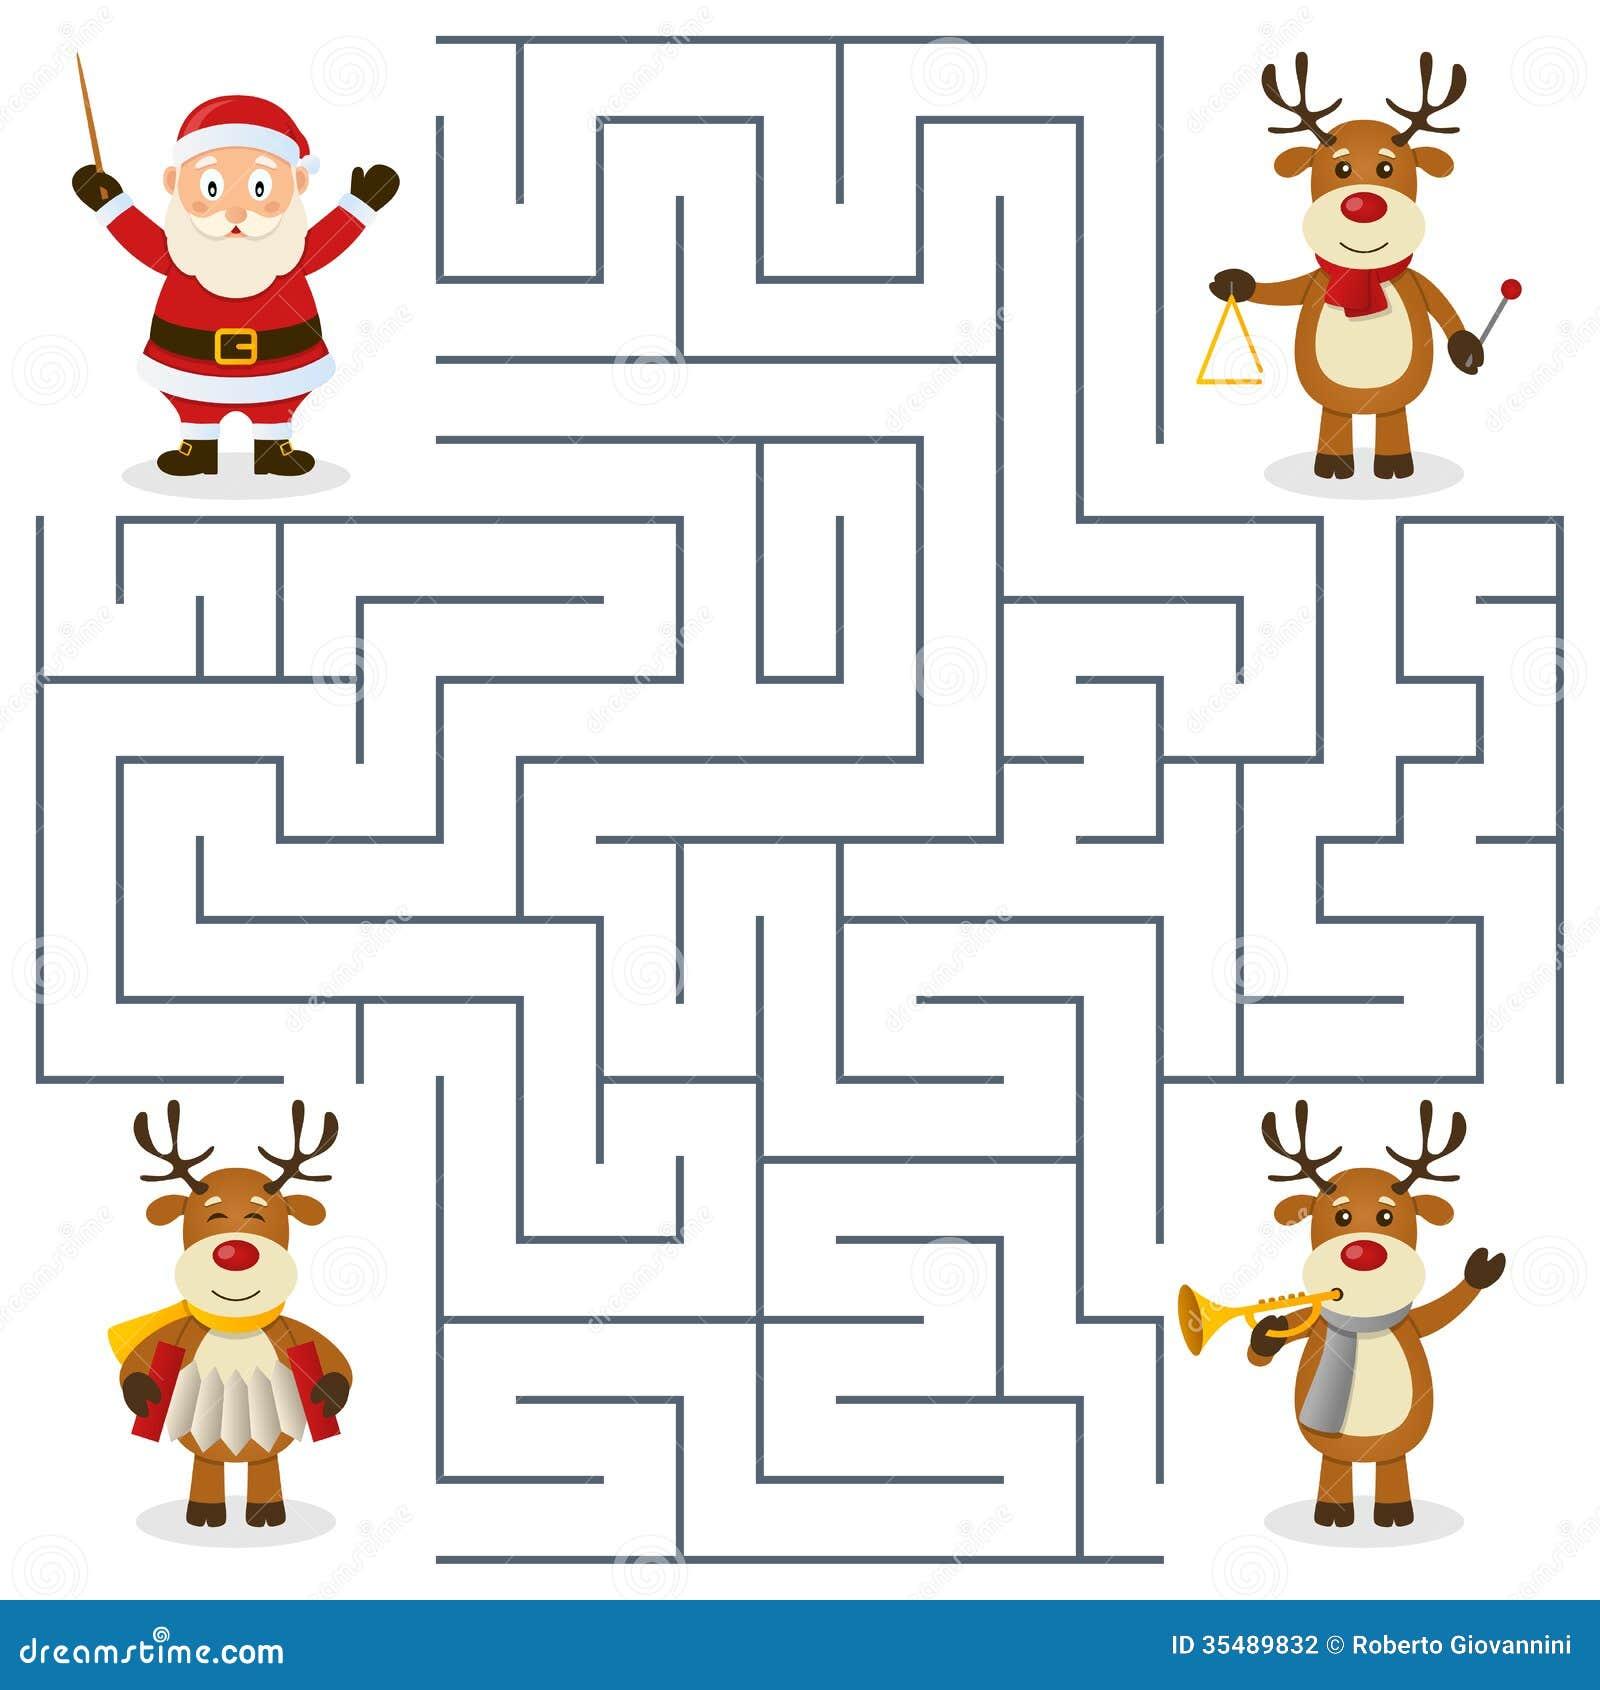 Reindeer Orchestra Maze For Kids Stock Vector - Illustration of ...